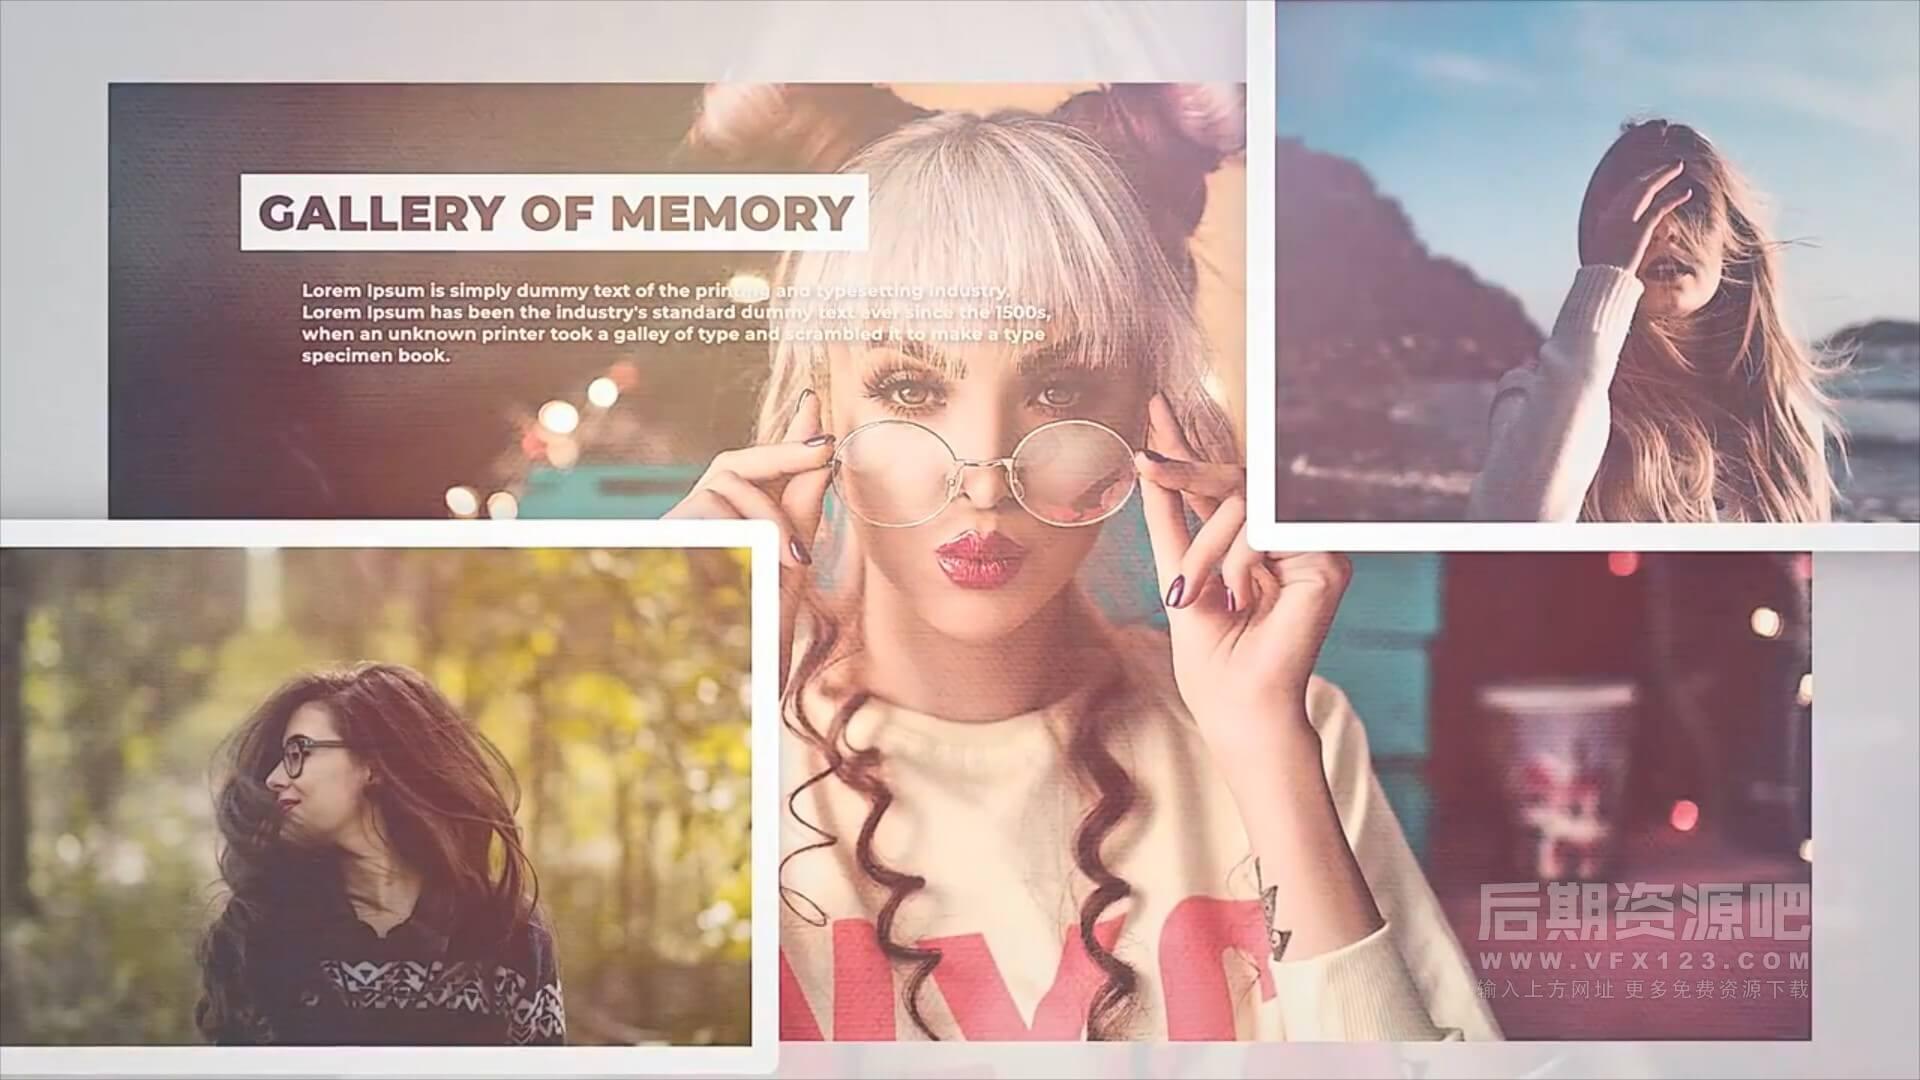 fcpx插件 亮丽优雅图文相册展示模板 Gallery Of Memory